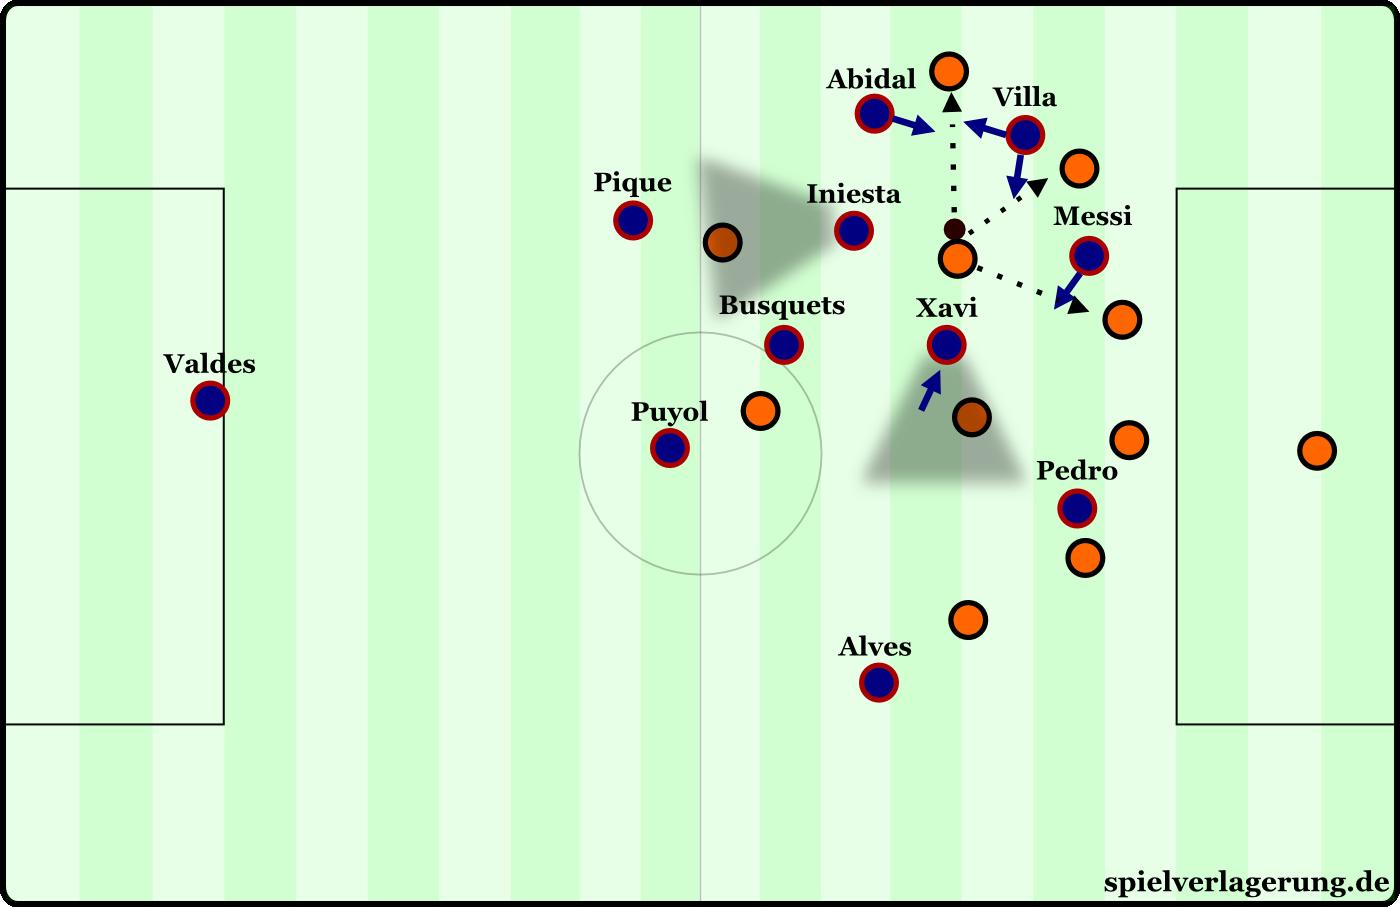 Guardiola's passing lane oriented counterpress